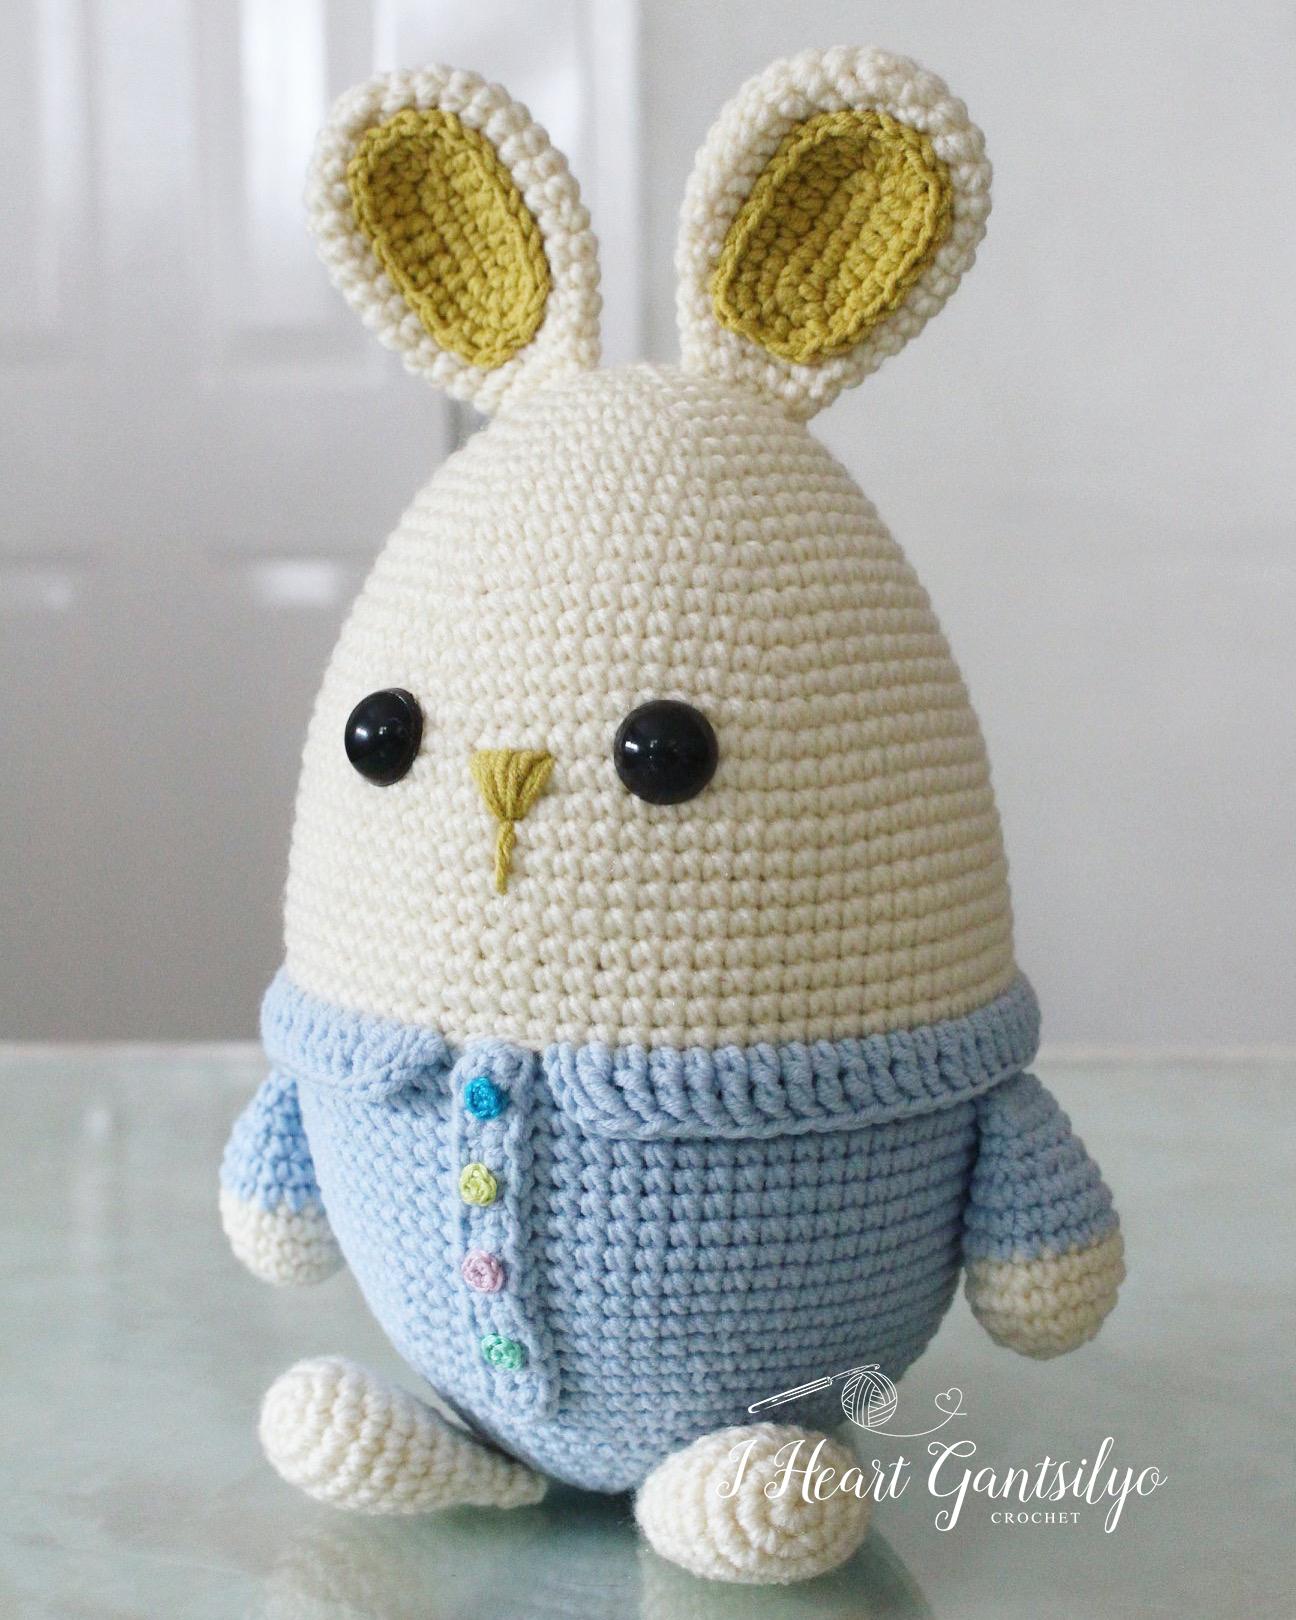 Pretty Bunny amigurumi in pink dress | Crochet rabbit, Crochet pig ... | 1620x1296